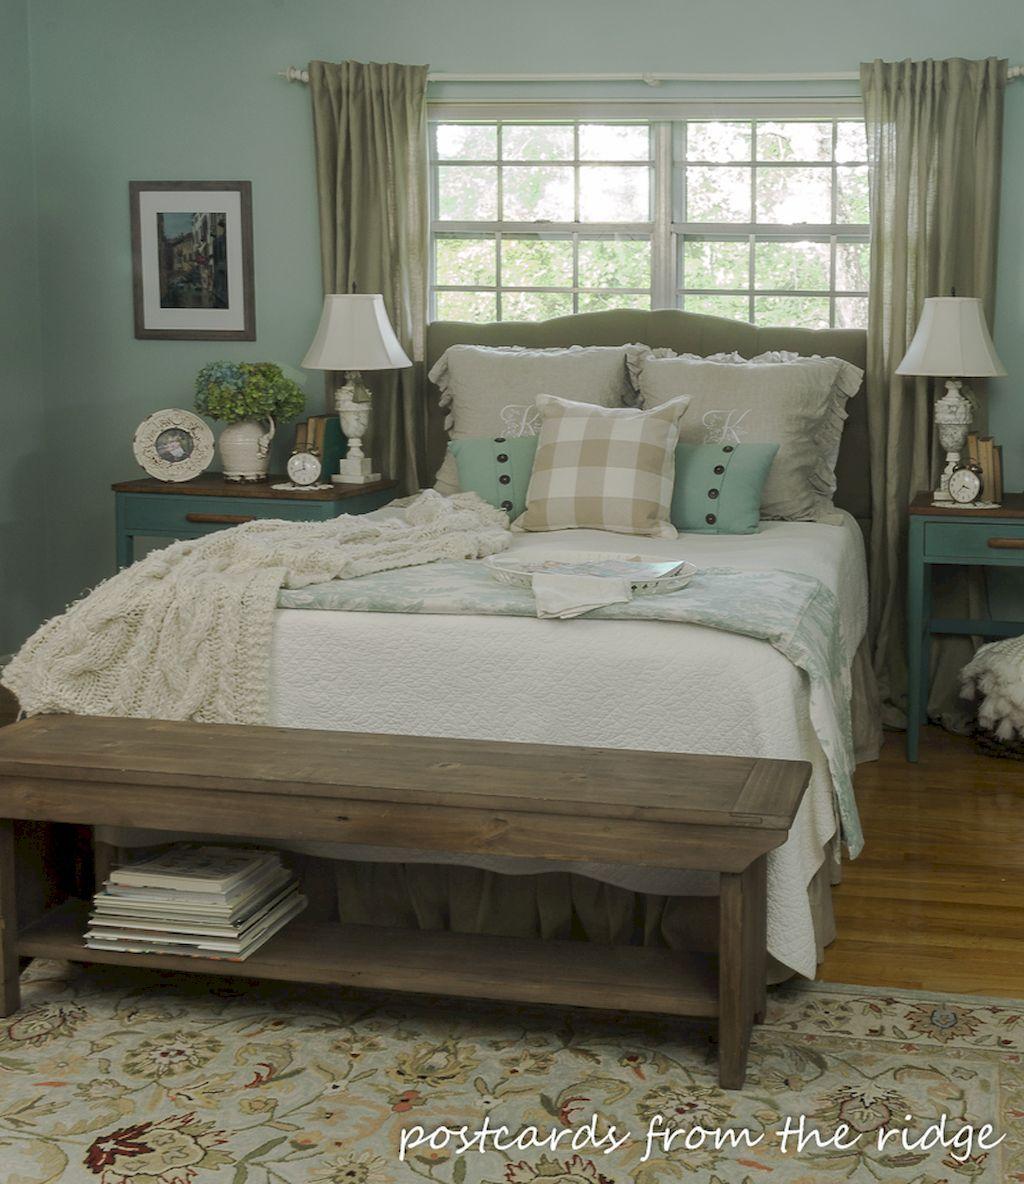 Master bedroom ideas  Adorable  Rustic Farmhouse Style Master Bedroom Ideas